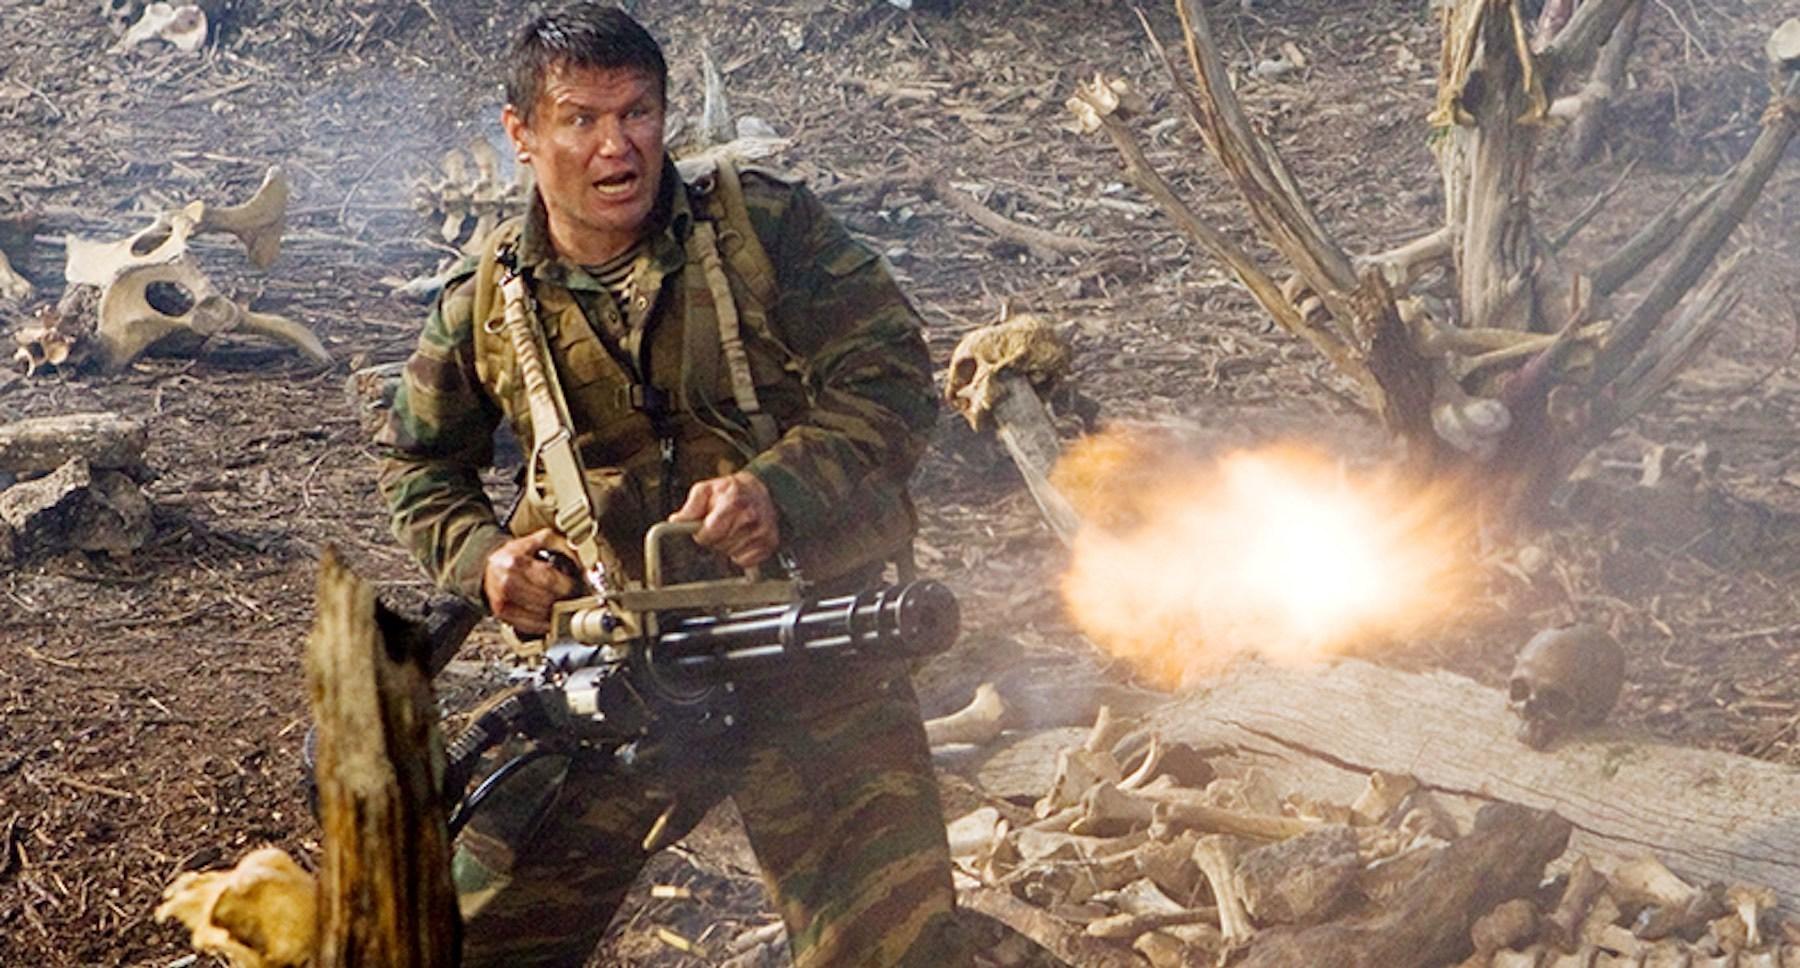 Oleg Taktarov (as Nikolai) firing a large gun in Predators